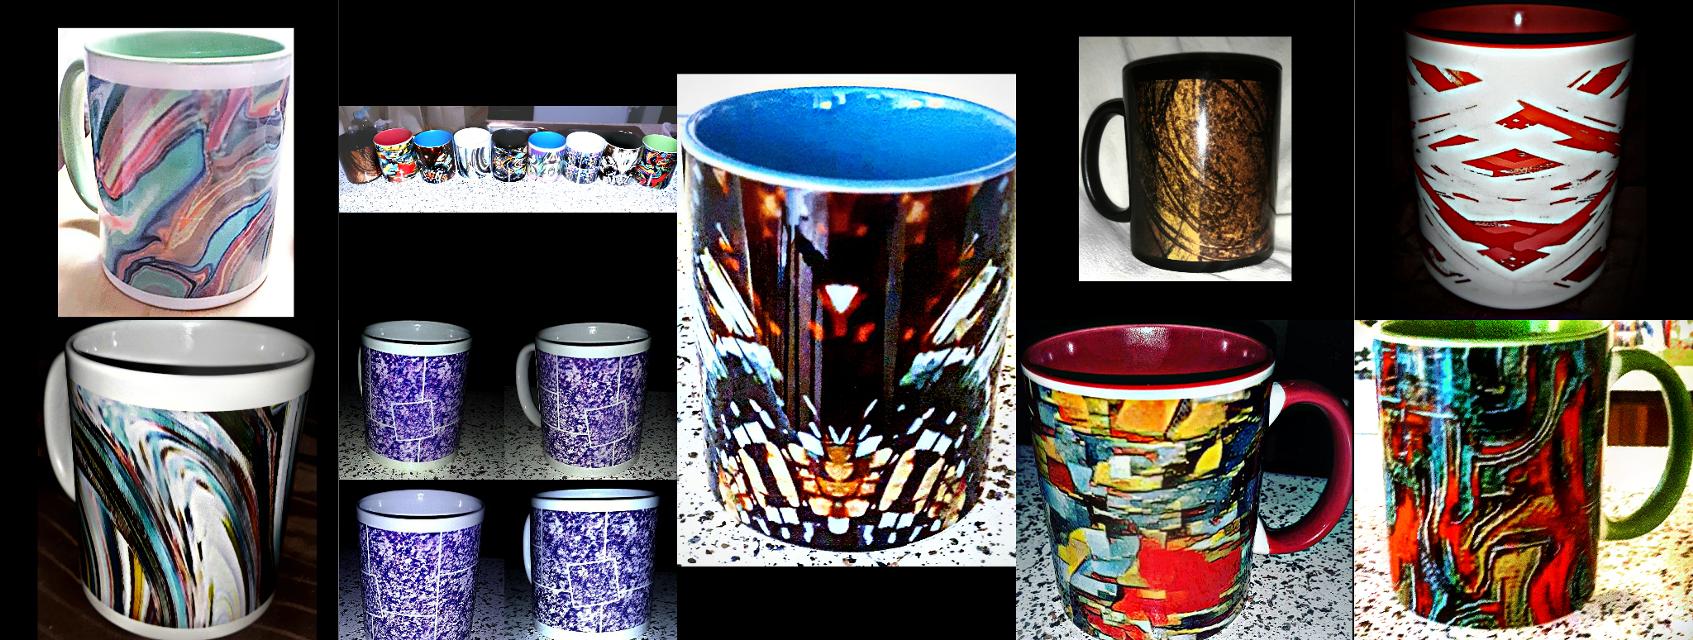 "Some of my favorites. Mugs from my Etsy shop ""Eclectic Mornings"".soon to be my Zazzle shop ""Little Crafts"" as well. #coffeemug #designercoffeecup #designercoffeemug #coffeemugdesign #abstractart #ceramics #etsyshopseller #etsyshop #mug #mydesign #mycraft #zazzleshopseller #zazzle"